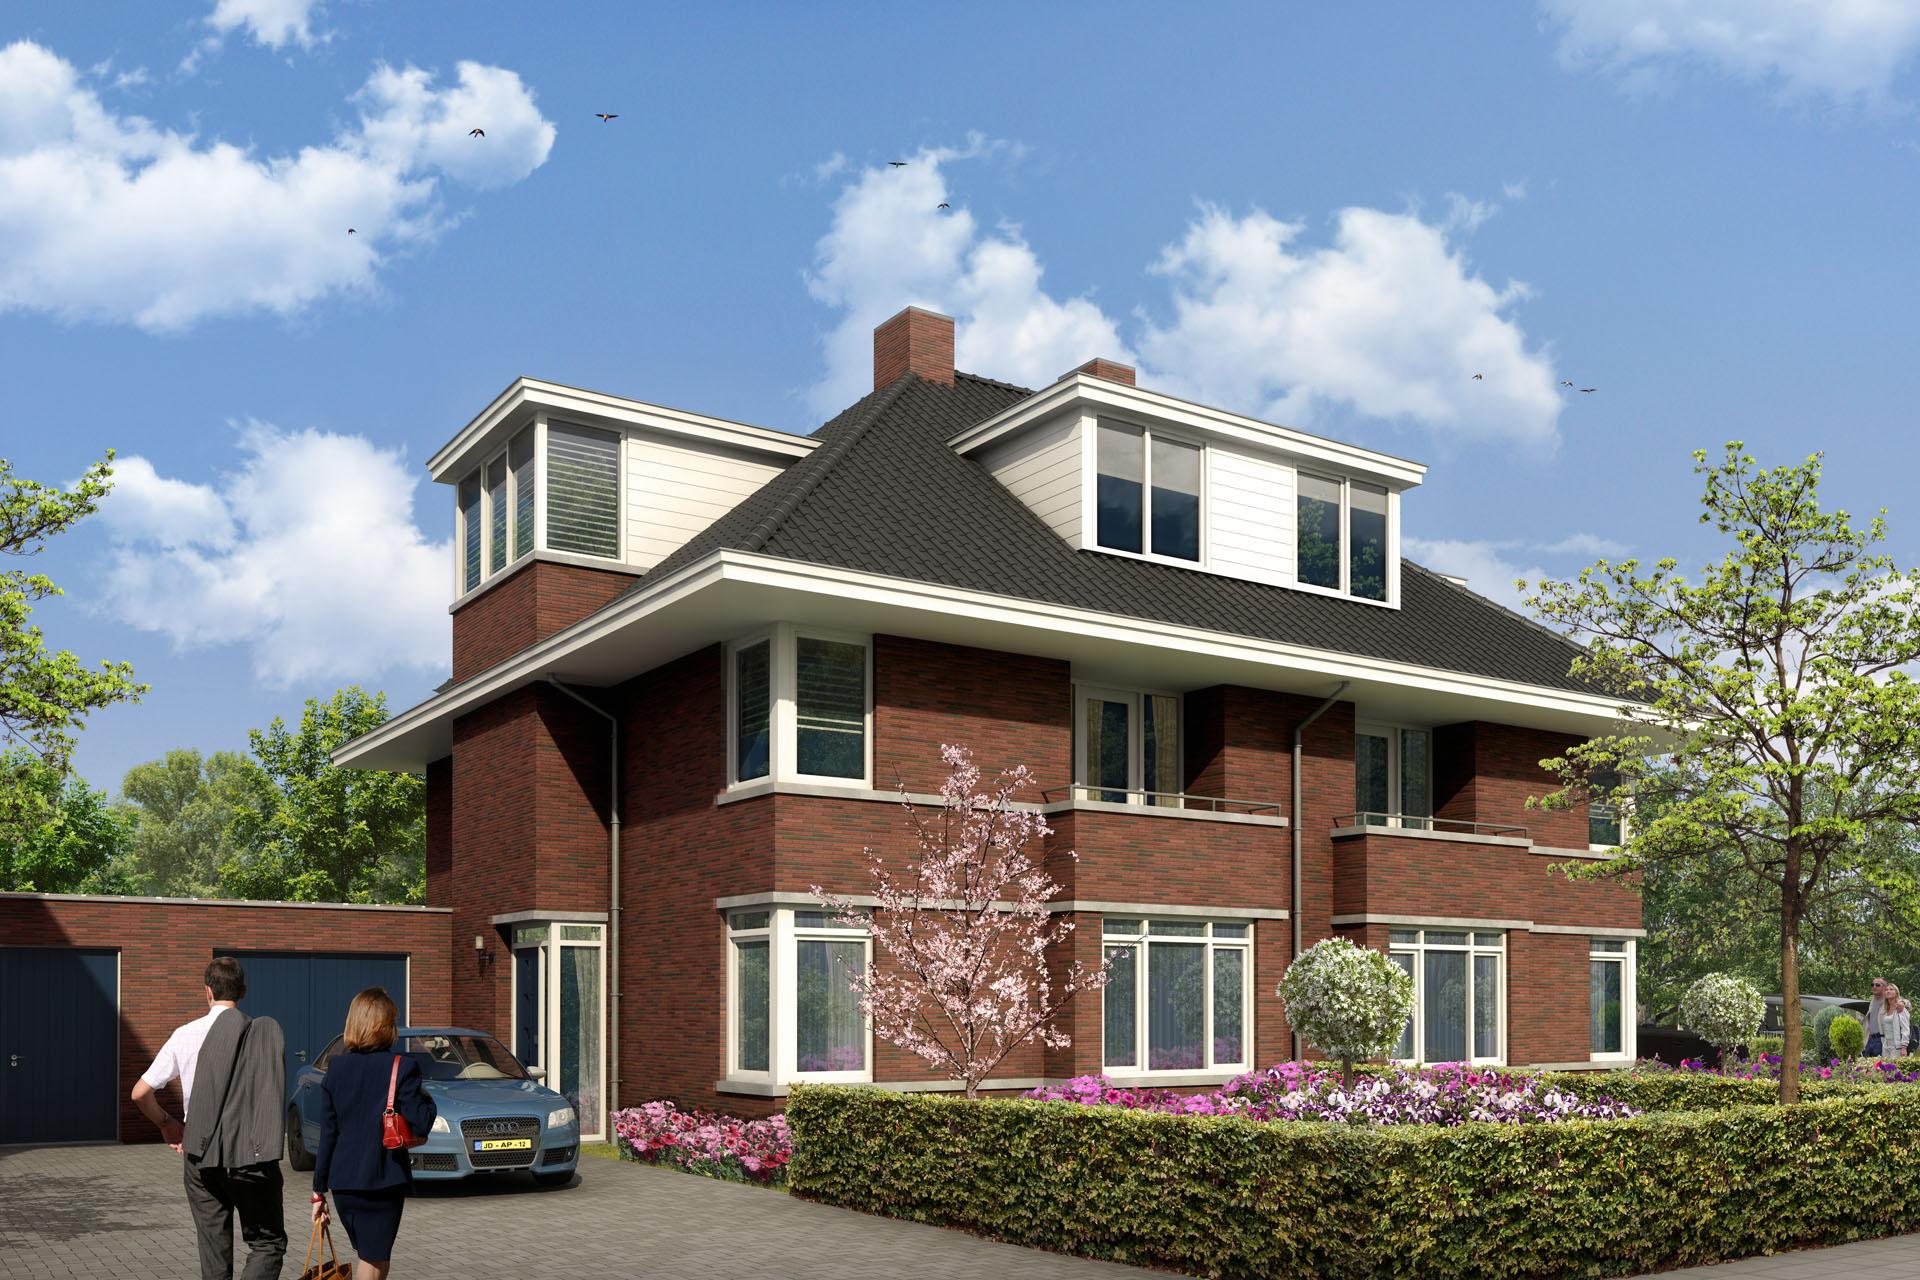 Project Laapersveld in Hilversum